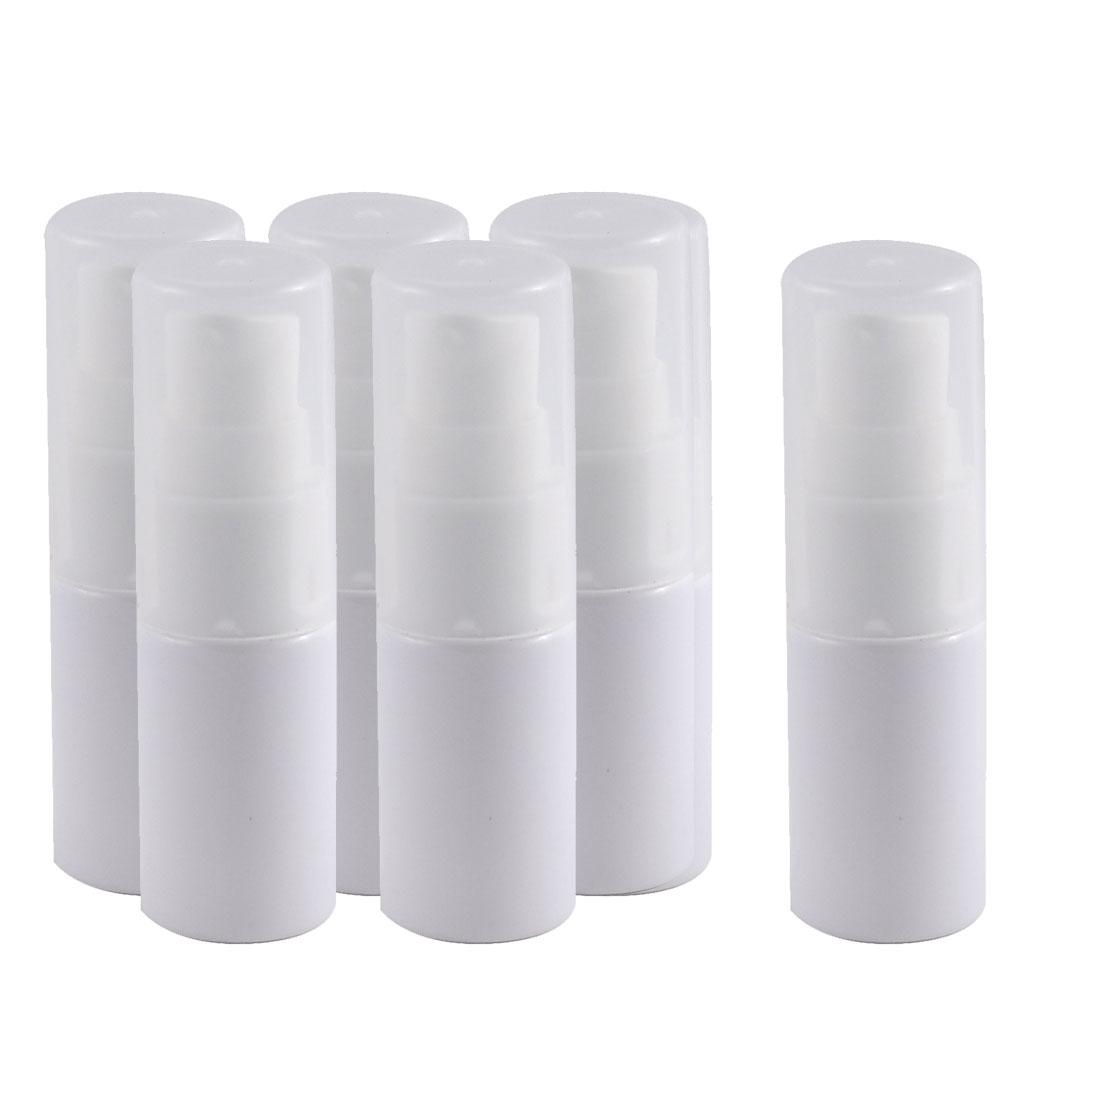 Travel Plastic Cosmetic Emulsion Press Pump Mist Spray Bottle White 10ml 6pcs